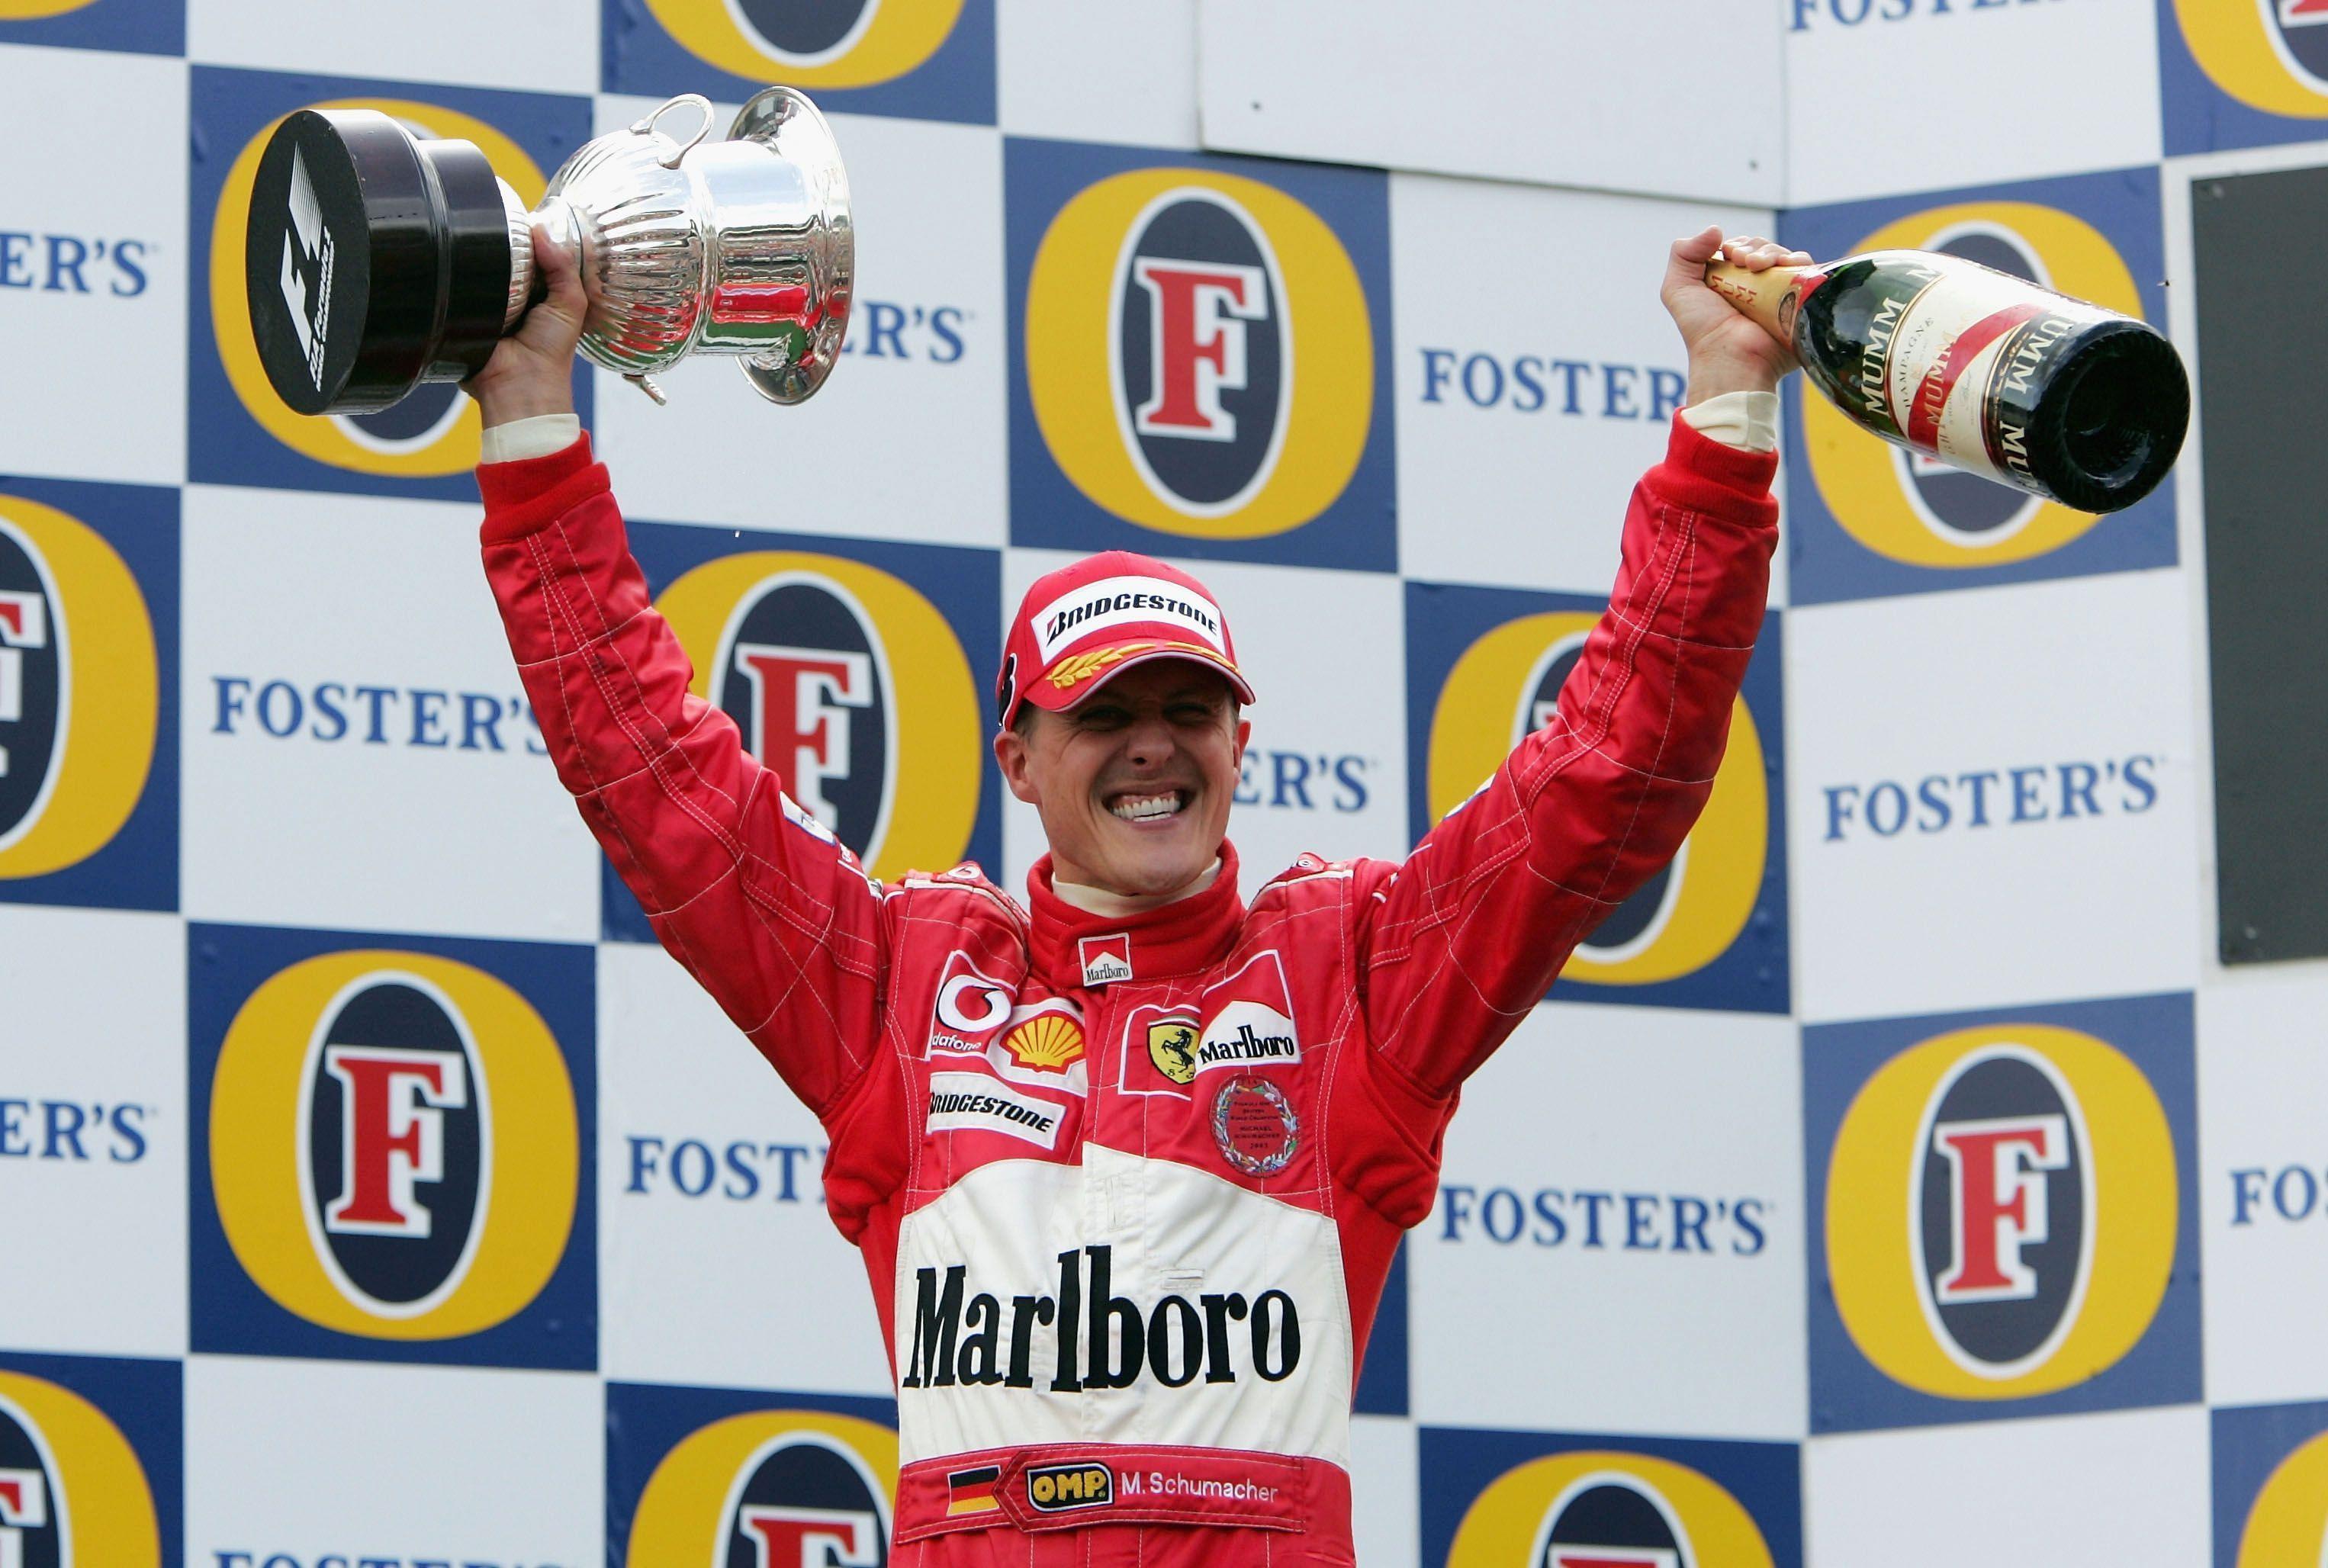 Schumacher dominó la F1